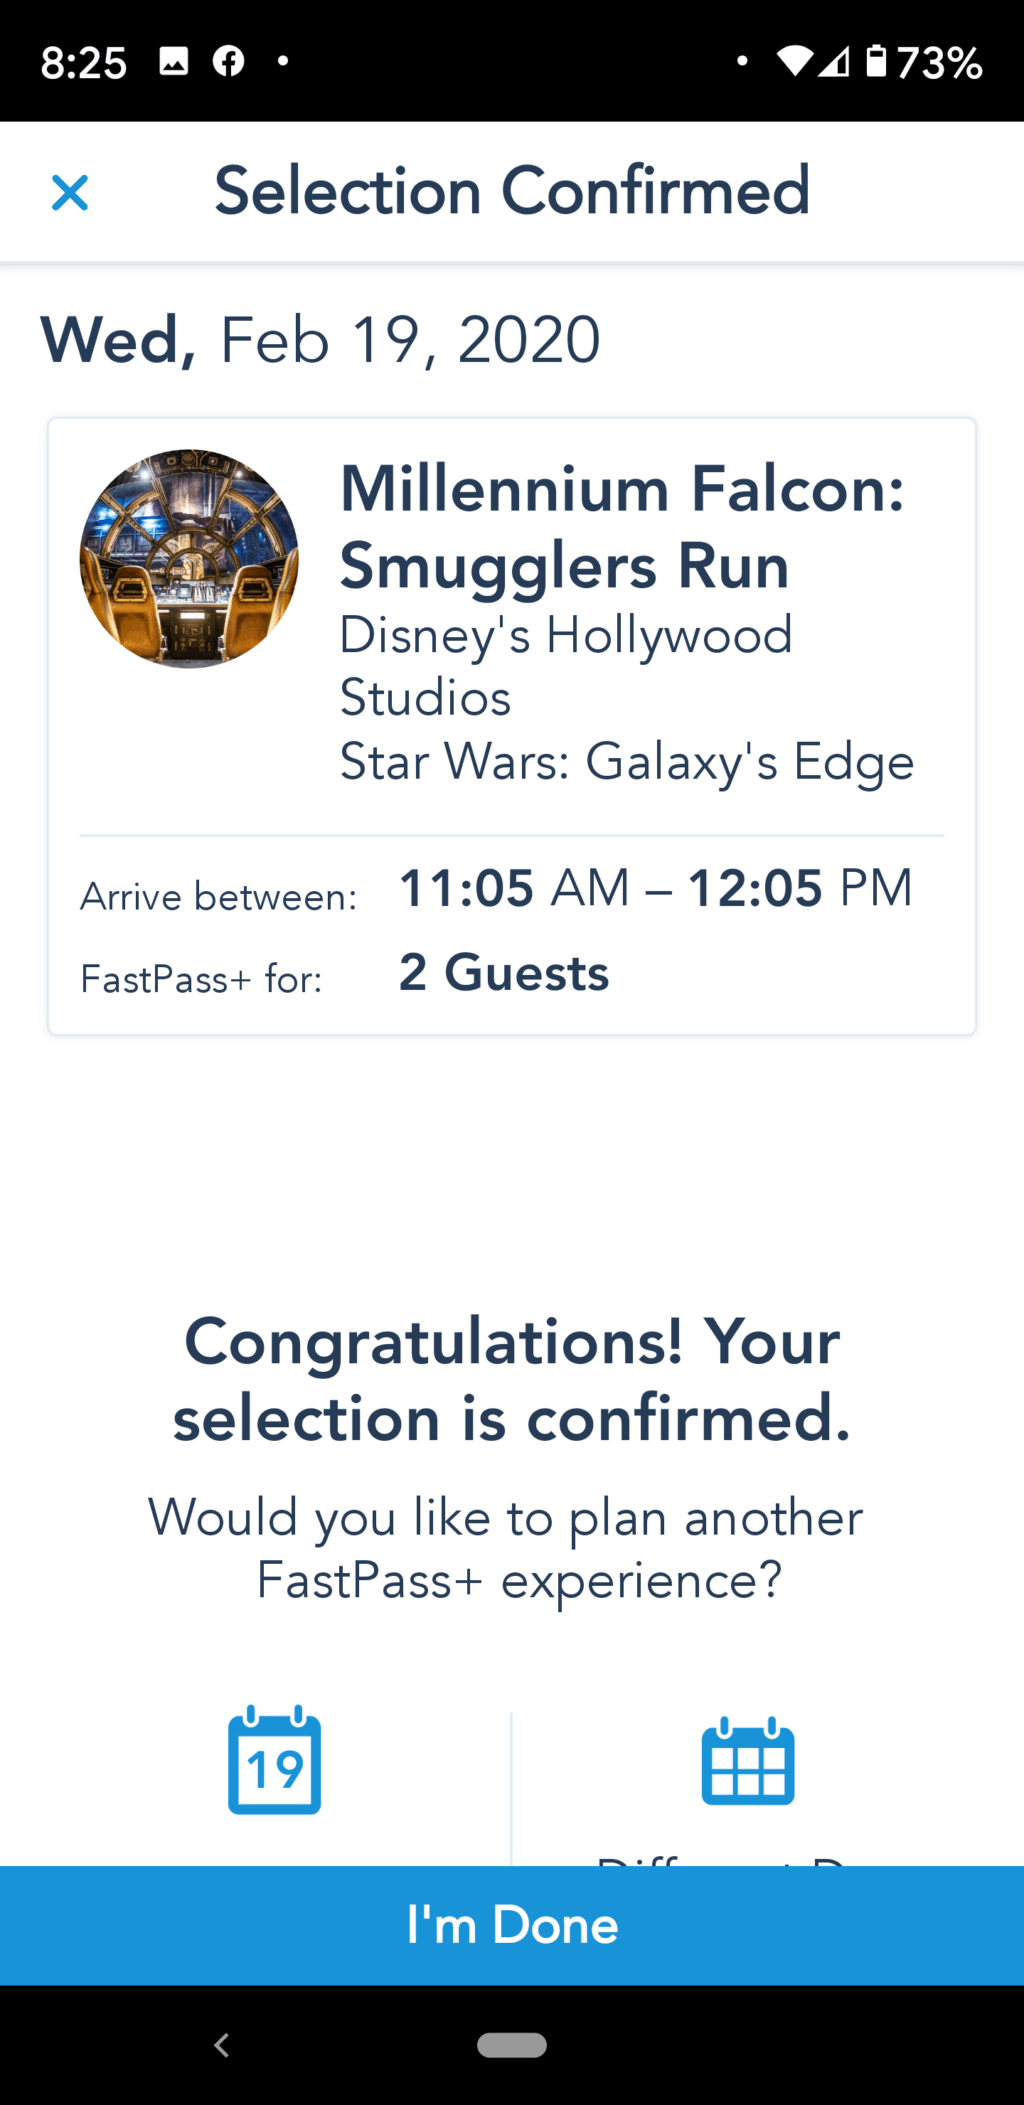 Millennium Falcon Smuggler's Run Fastpass+